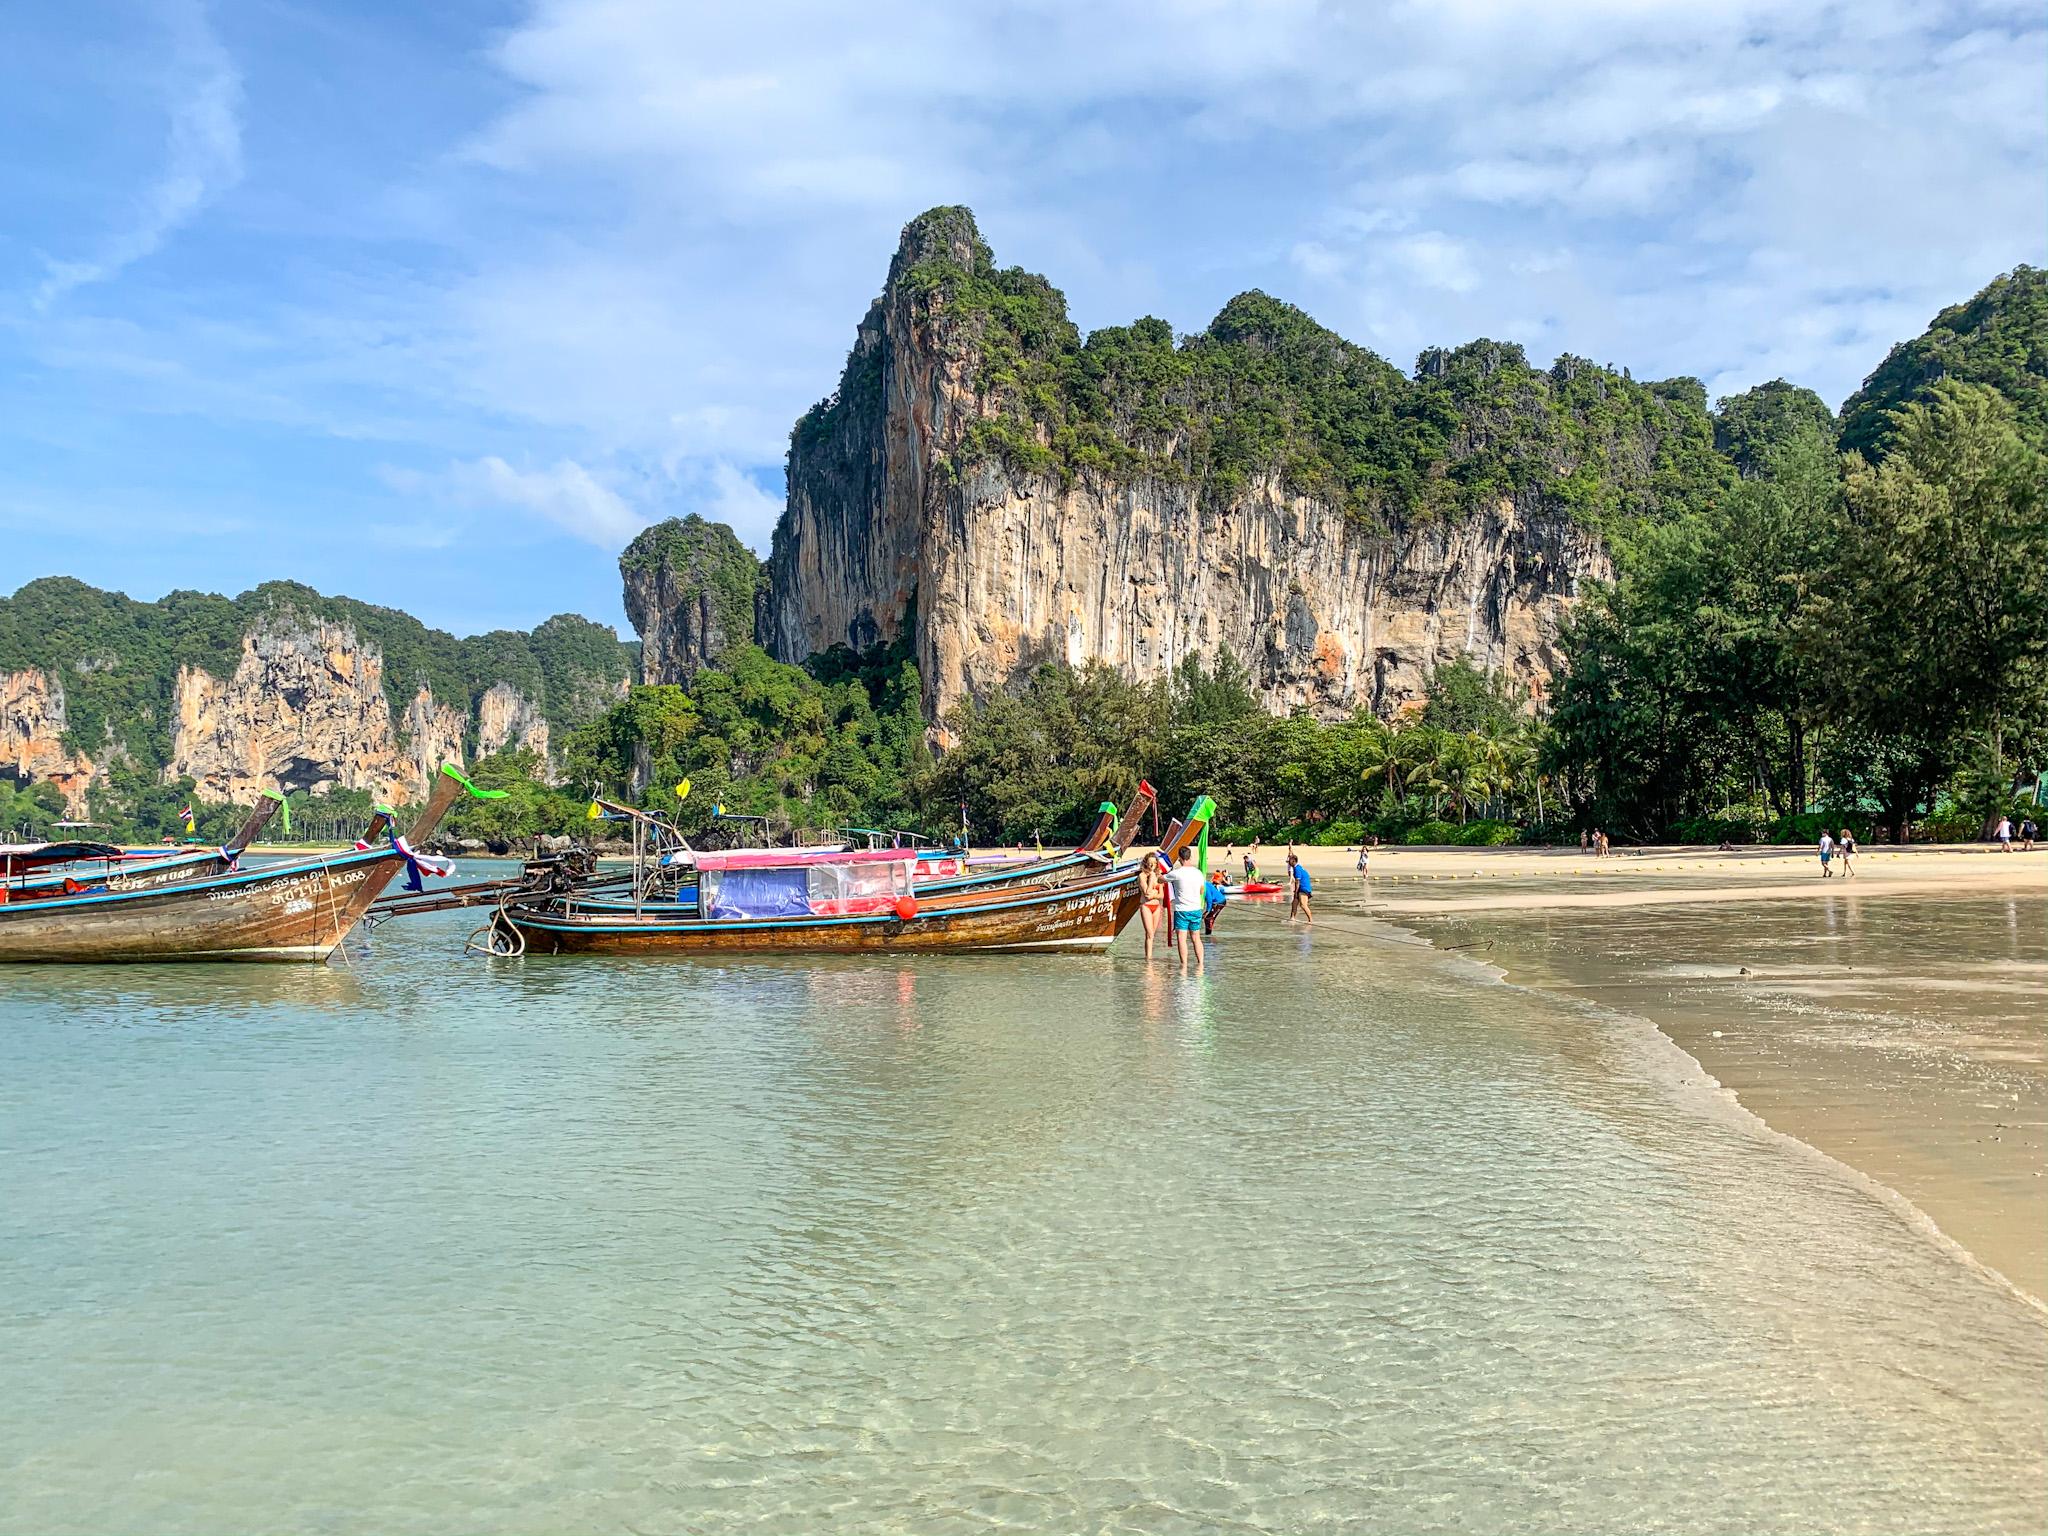 Spiaggia di Railay (West e East, Tonsai e Phra Nang)